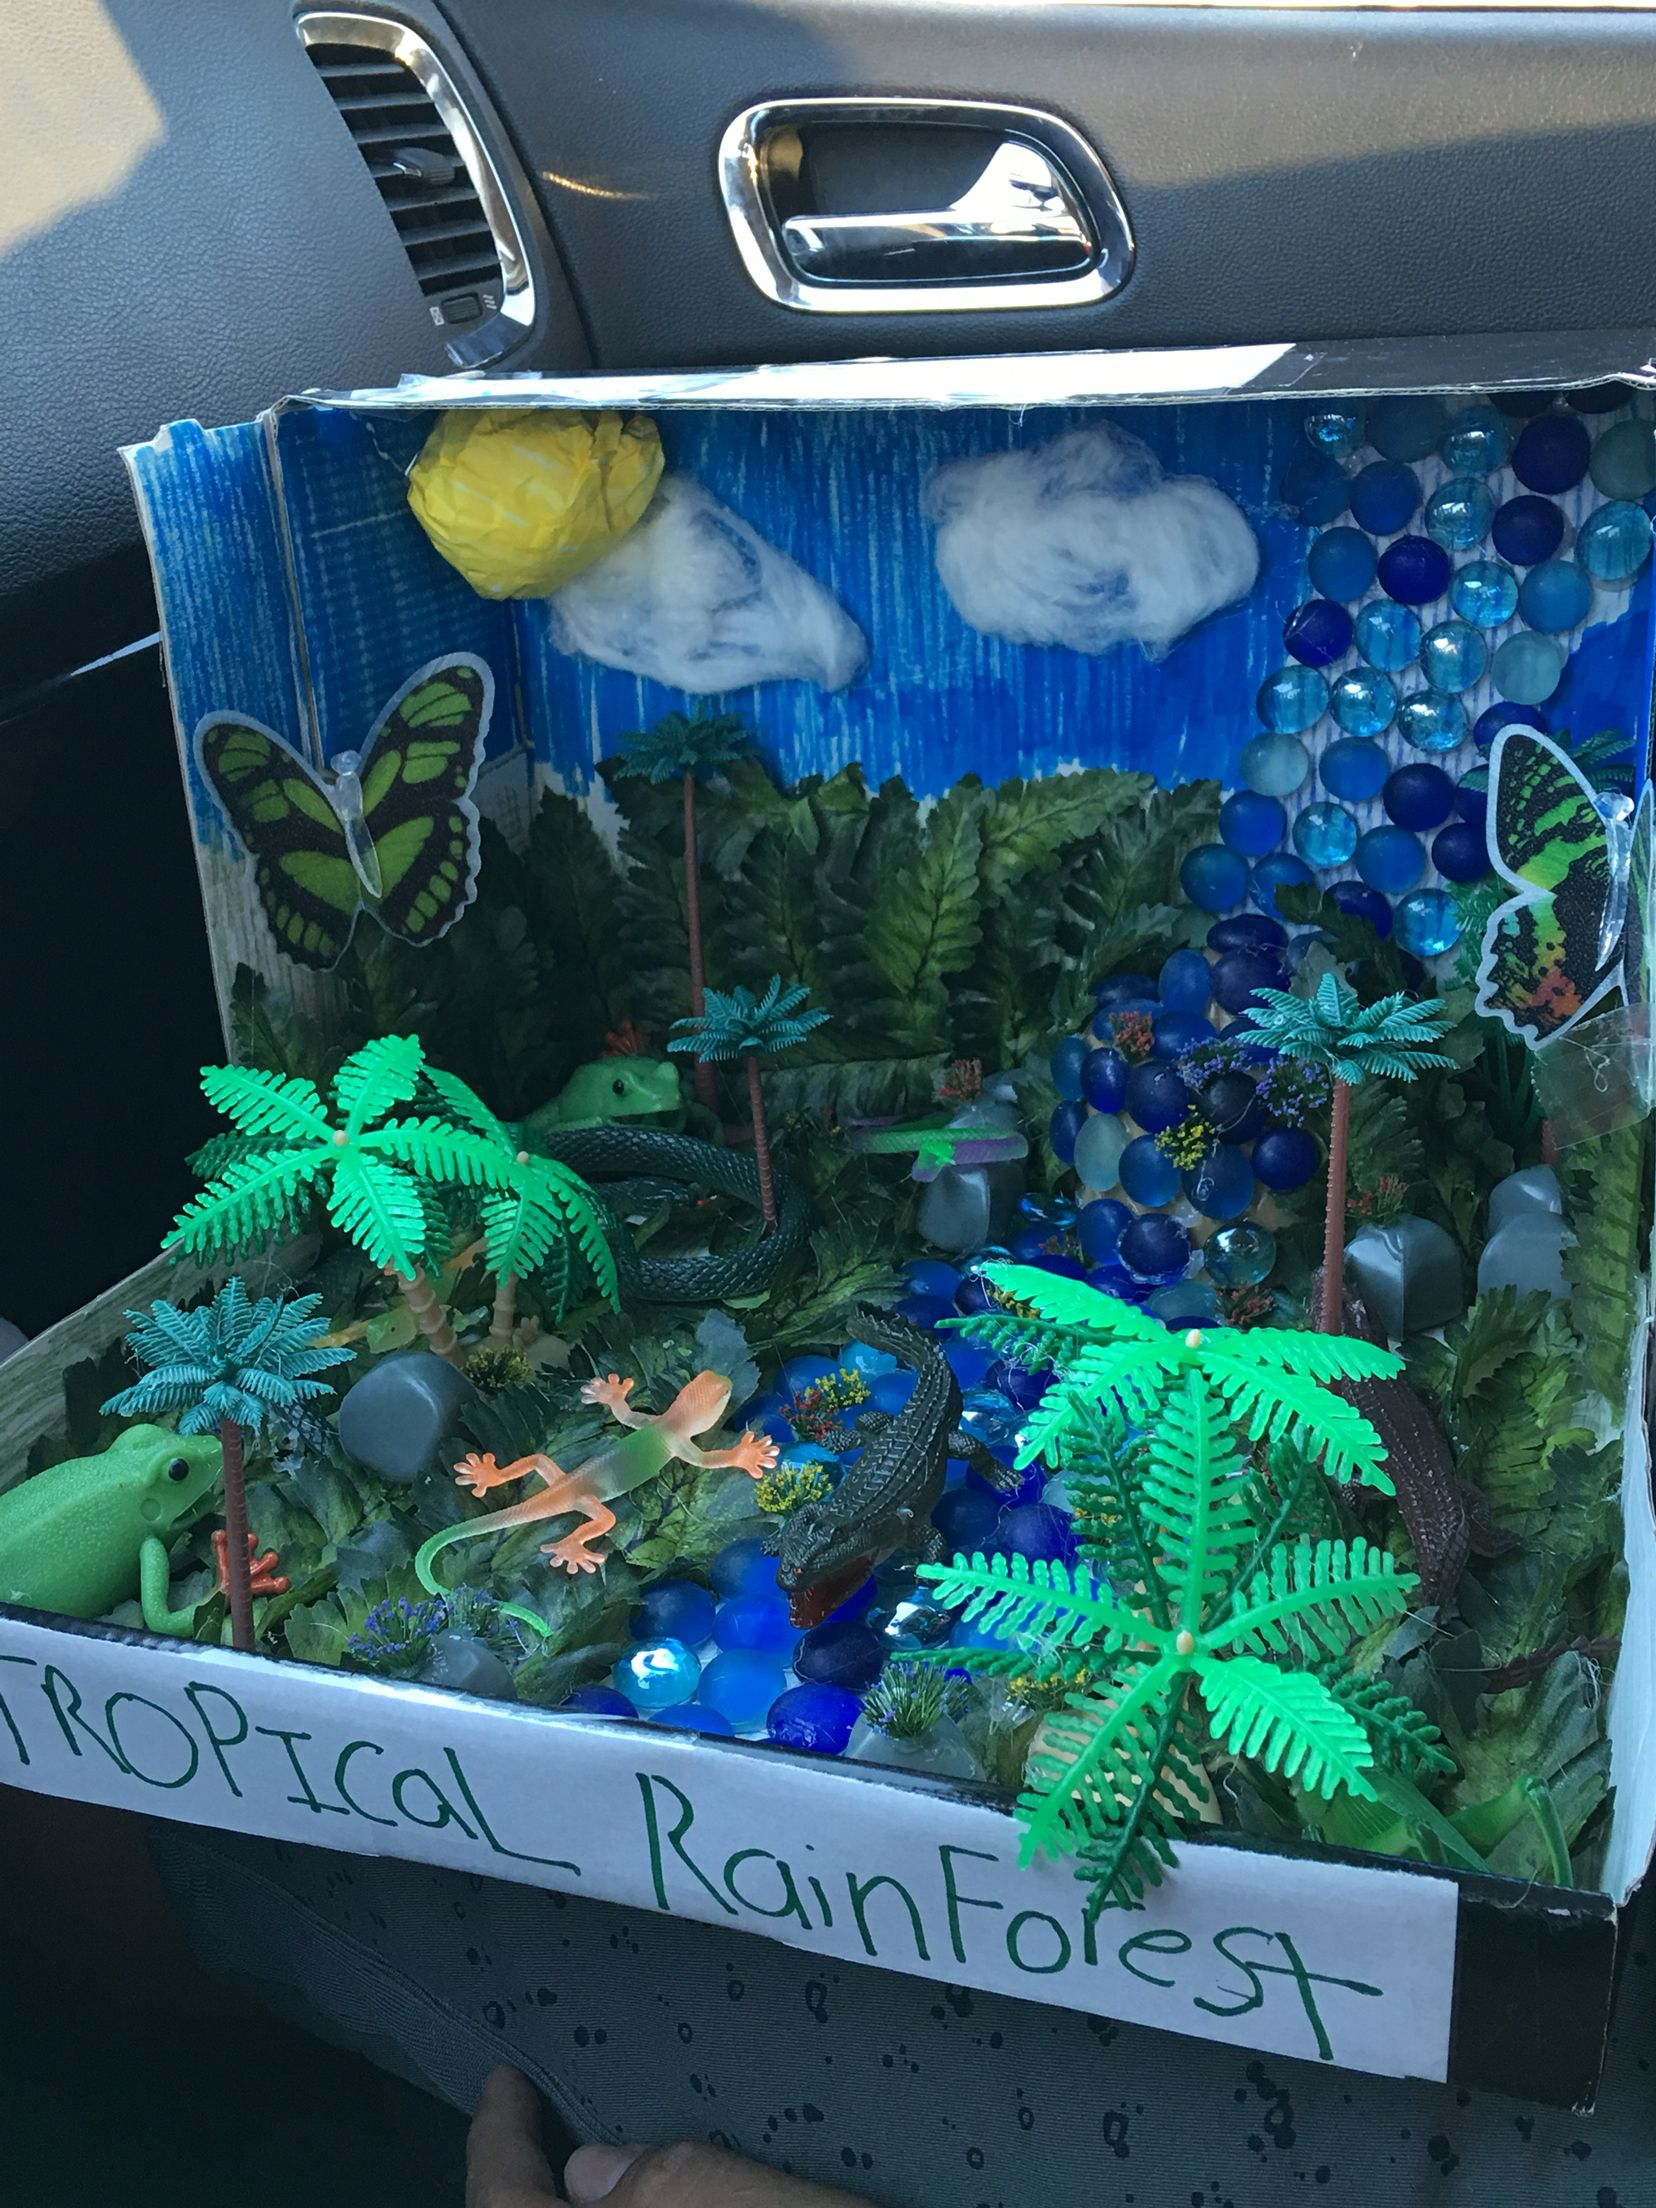 Biome Tropical Rainforest Project